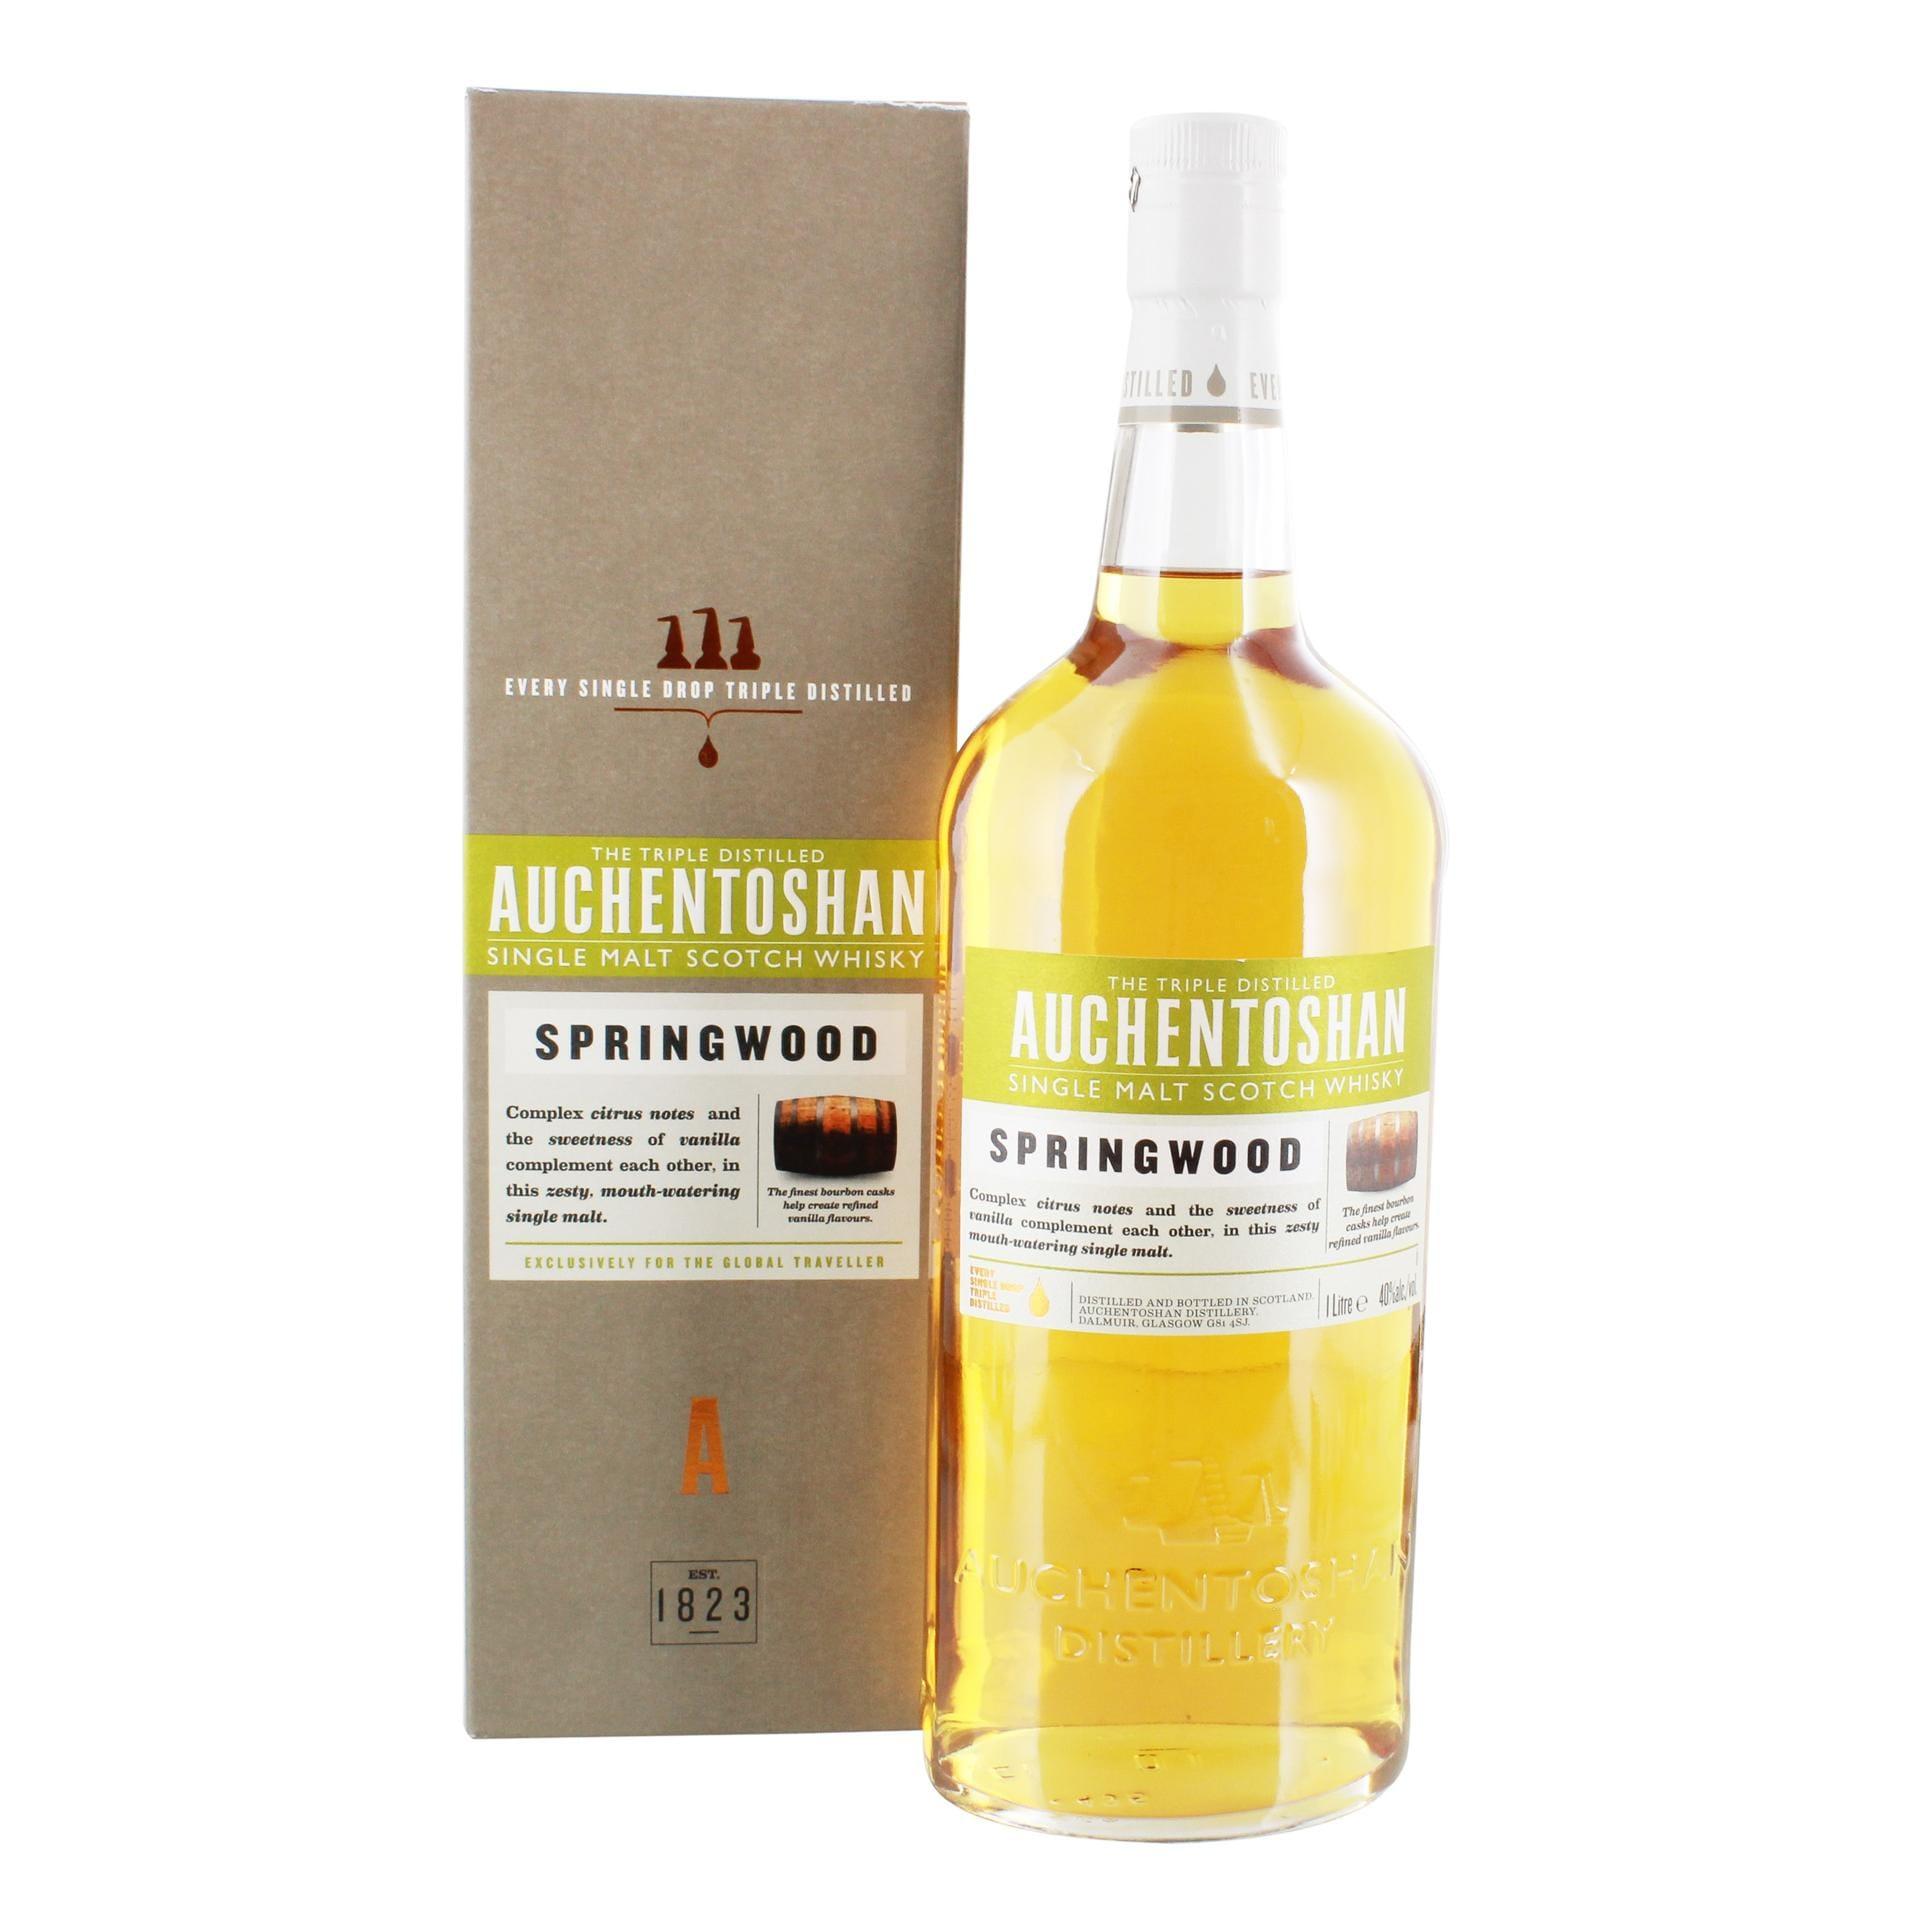 Auchentoshan Springwood Single Malt Scotch Whisky 1l